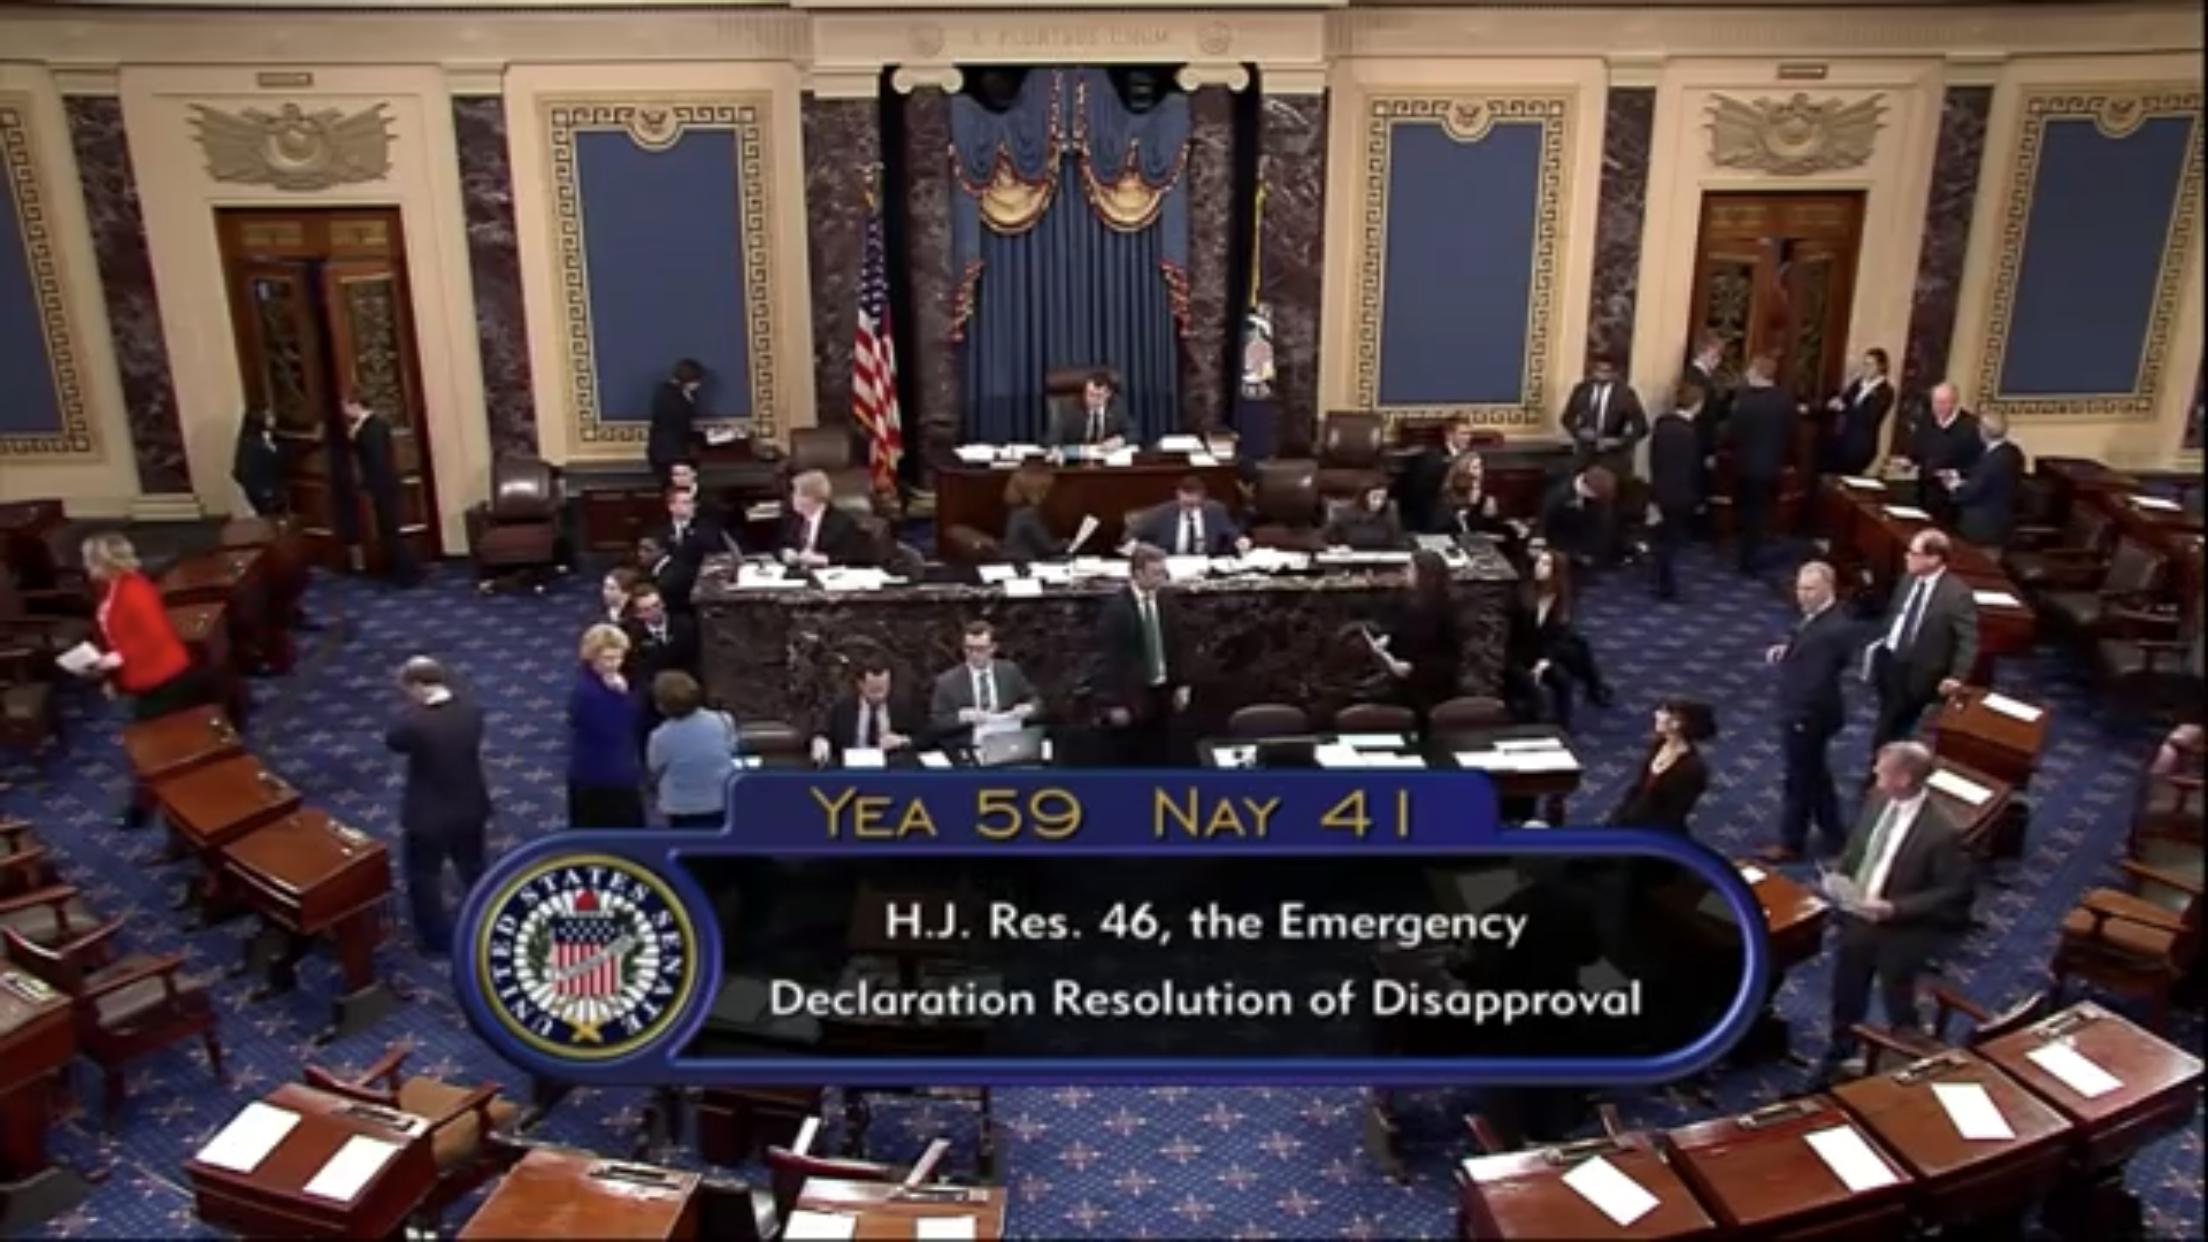 Senate Votes to Block President Trump's Emergency Declaration